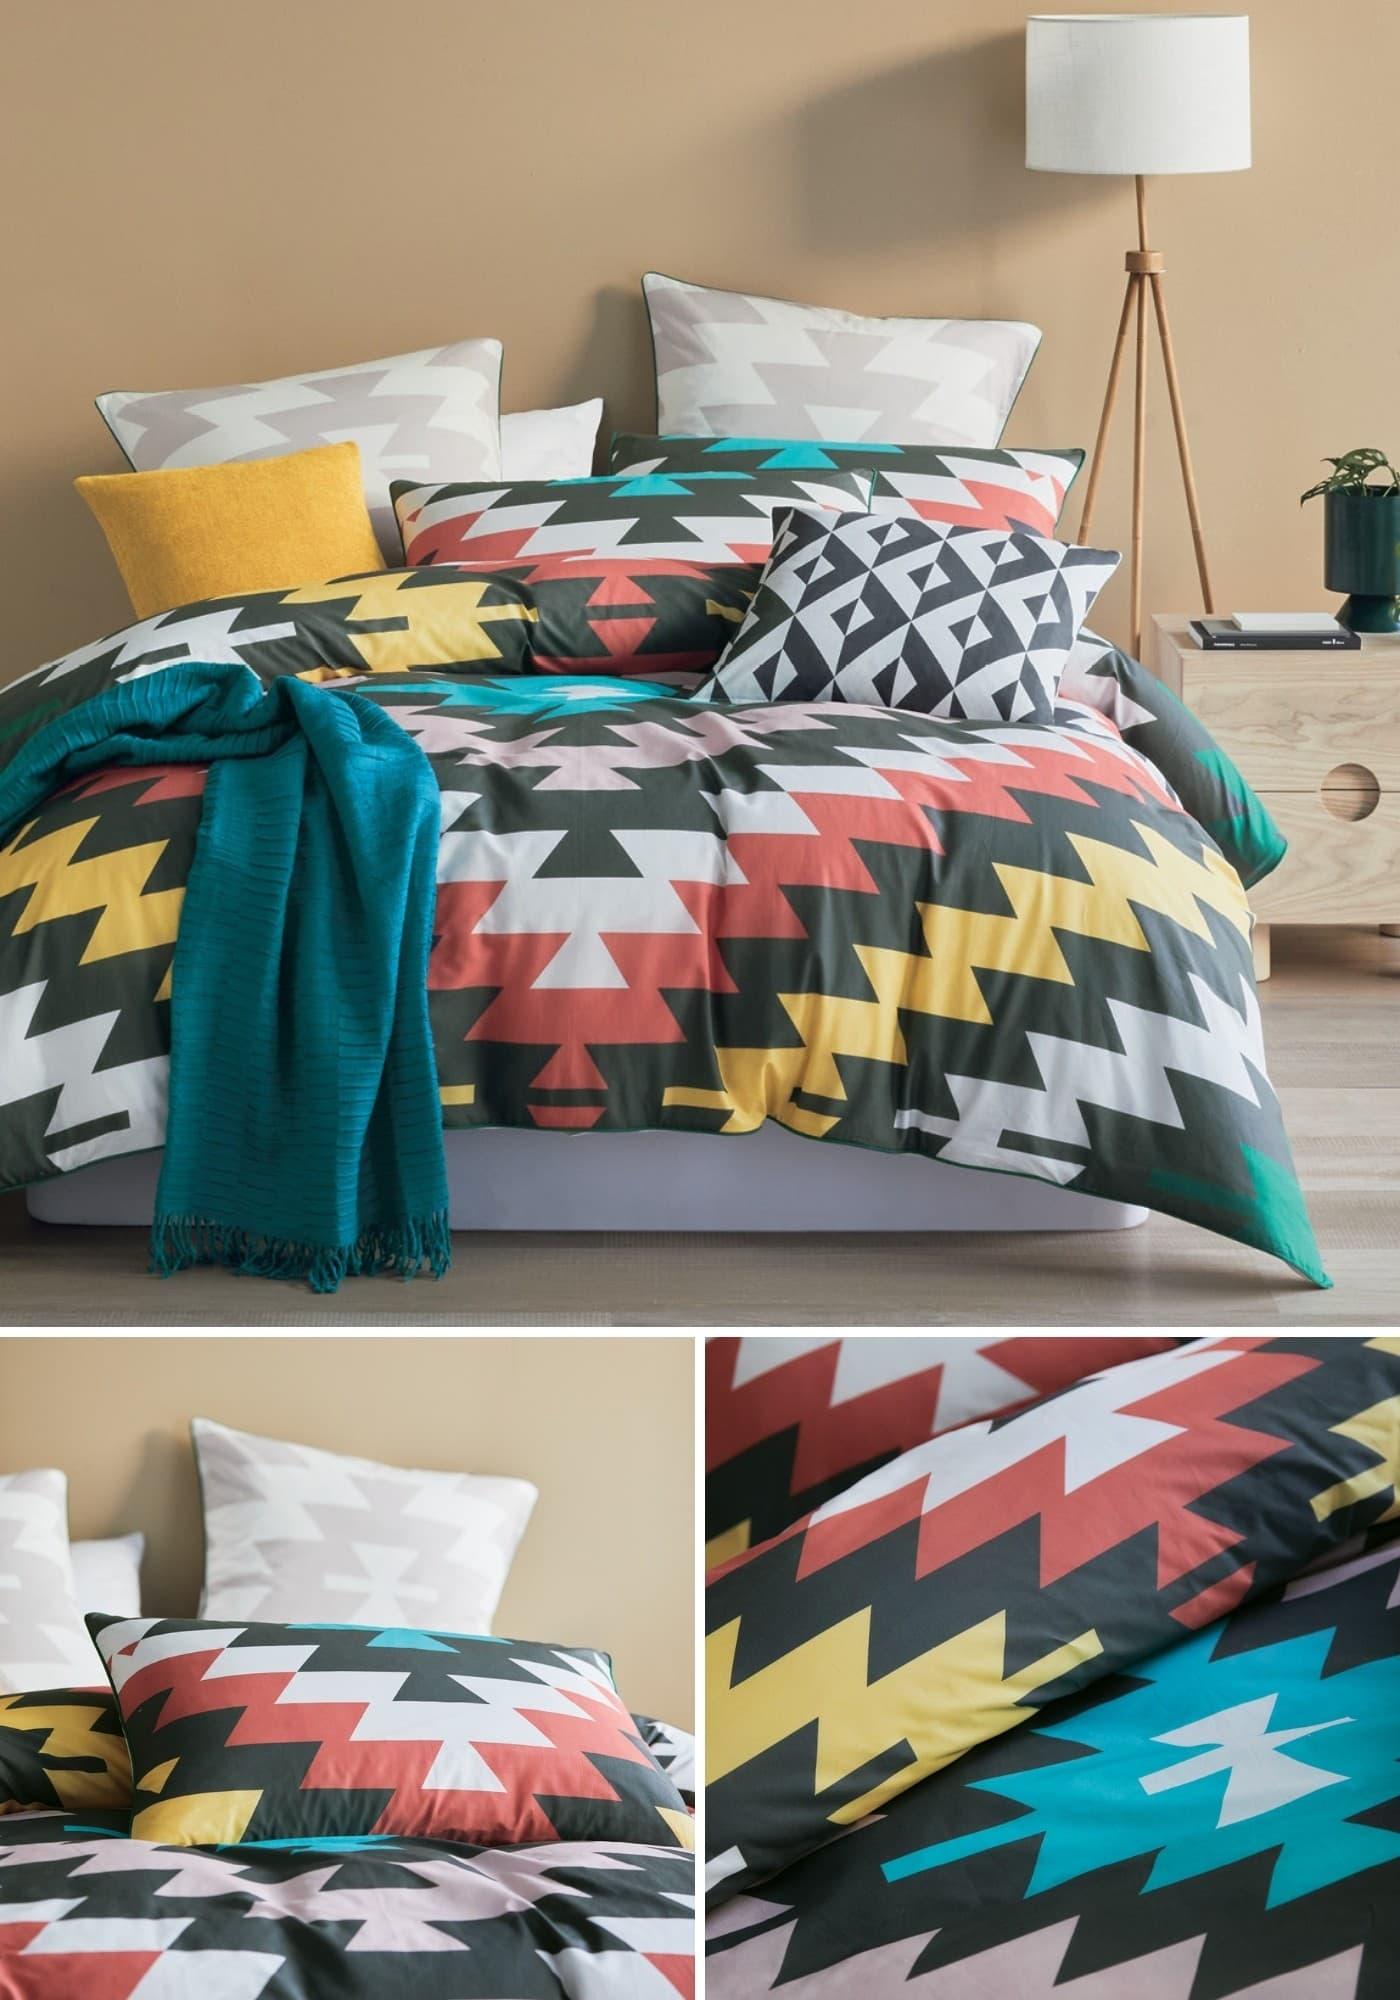 lorraine lea axel summer quilt cover set aztec bedspread